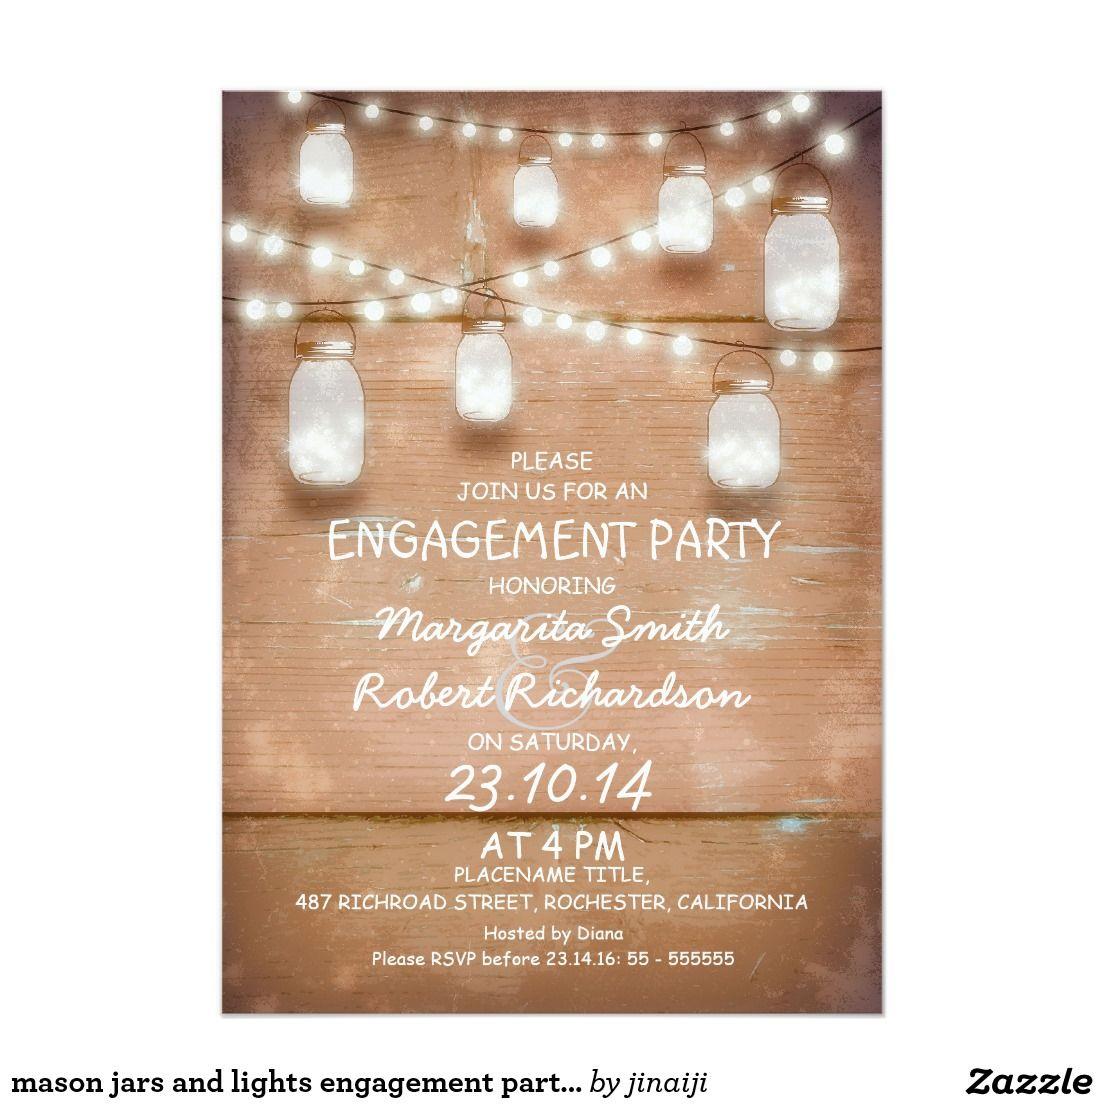 mason jars and lights engagement party invitation